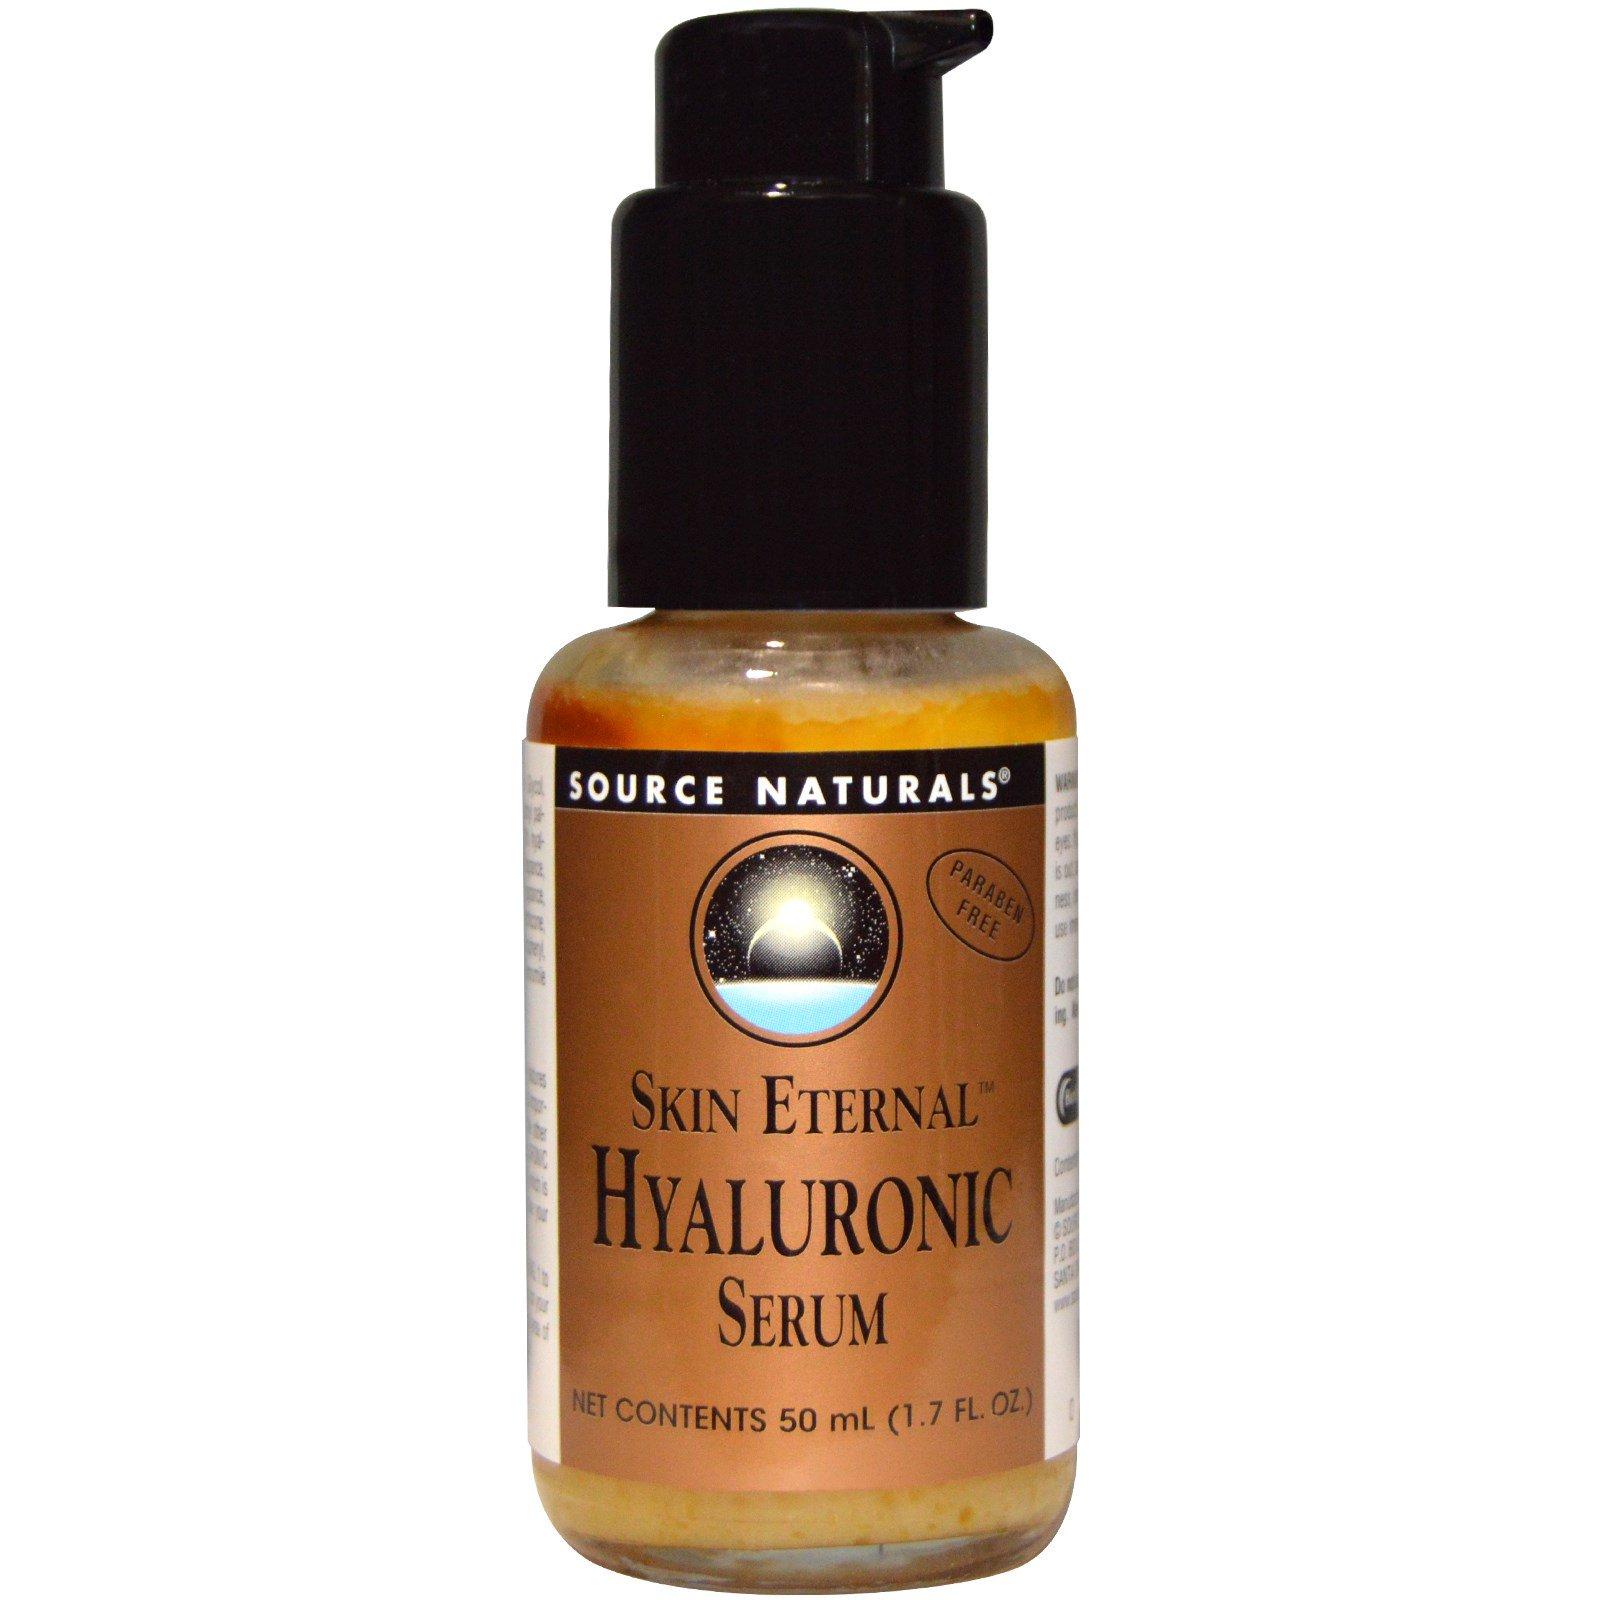 Source Naturals, Skin Eternal, Hyaluronic Serum, 1.7 fl oz(pack of 3) Enprani WhiteCell Emulsion 4.06fl.oz/120ml